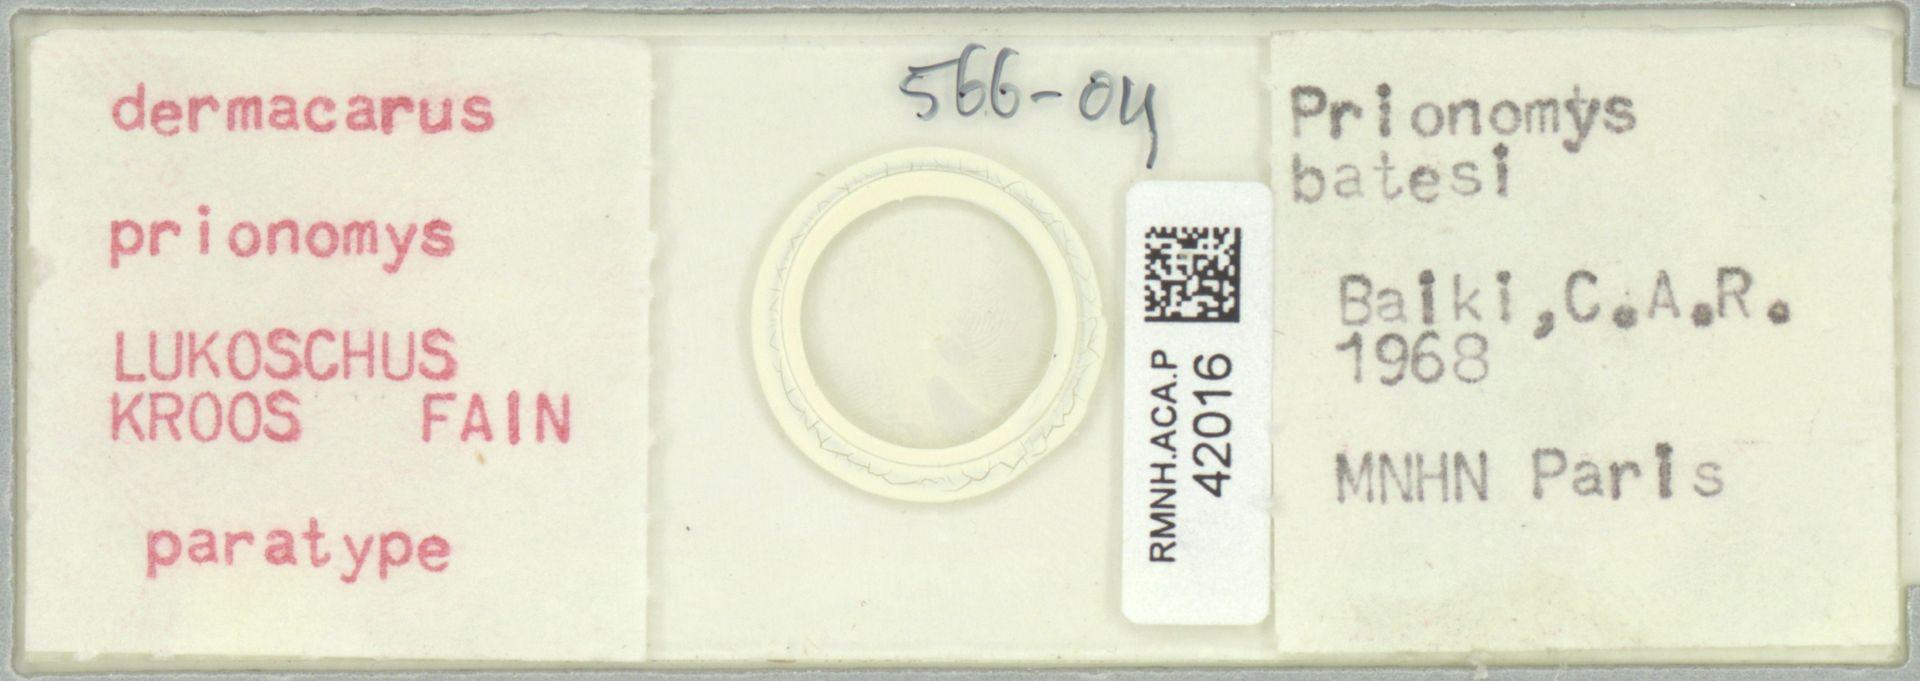 RMNH.ACA.P.42016   Dermacarus prionomys LUKOSCHUS KROOS FAIN